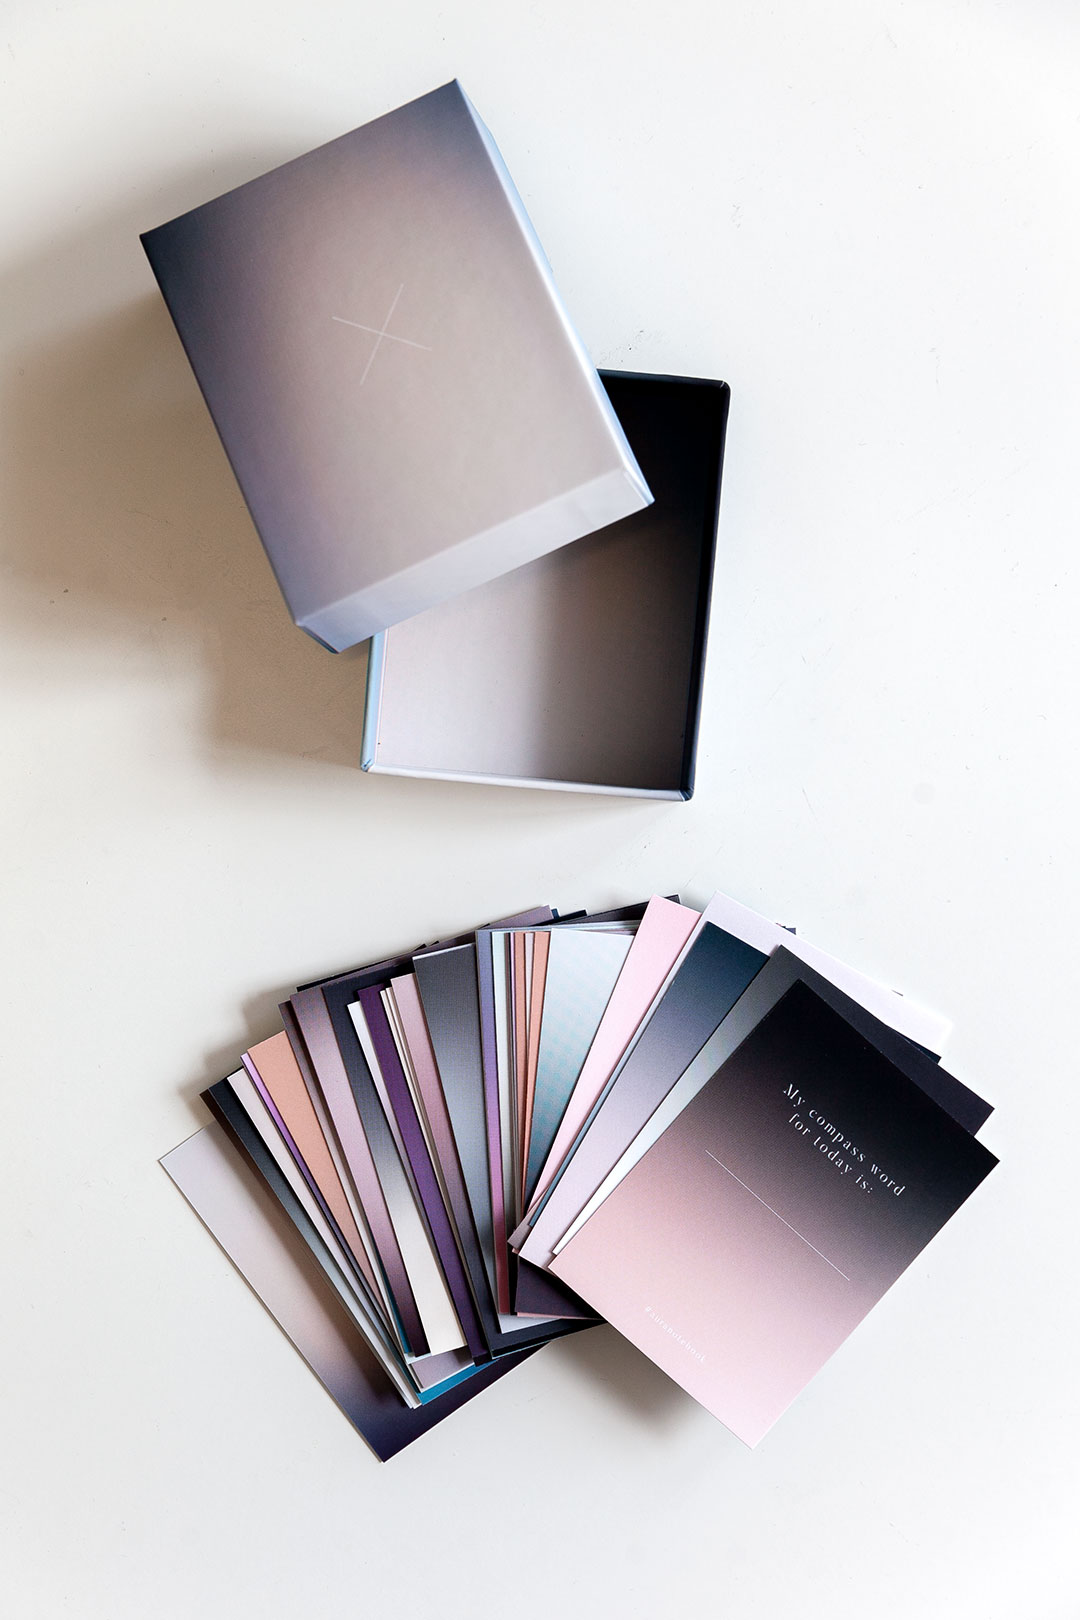 Aura notebook Miracle Lines | journaling-kortit 2